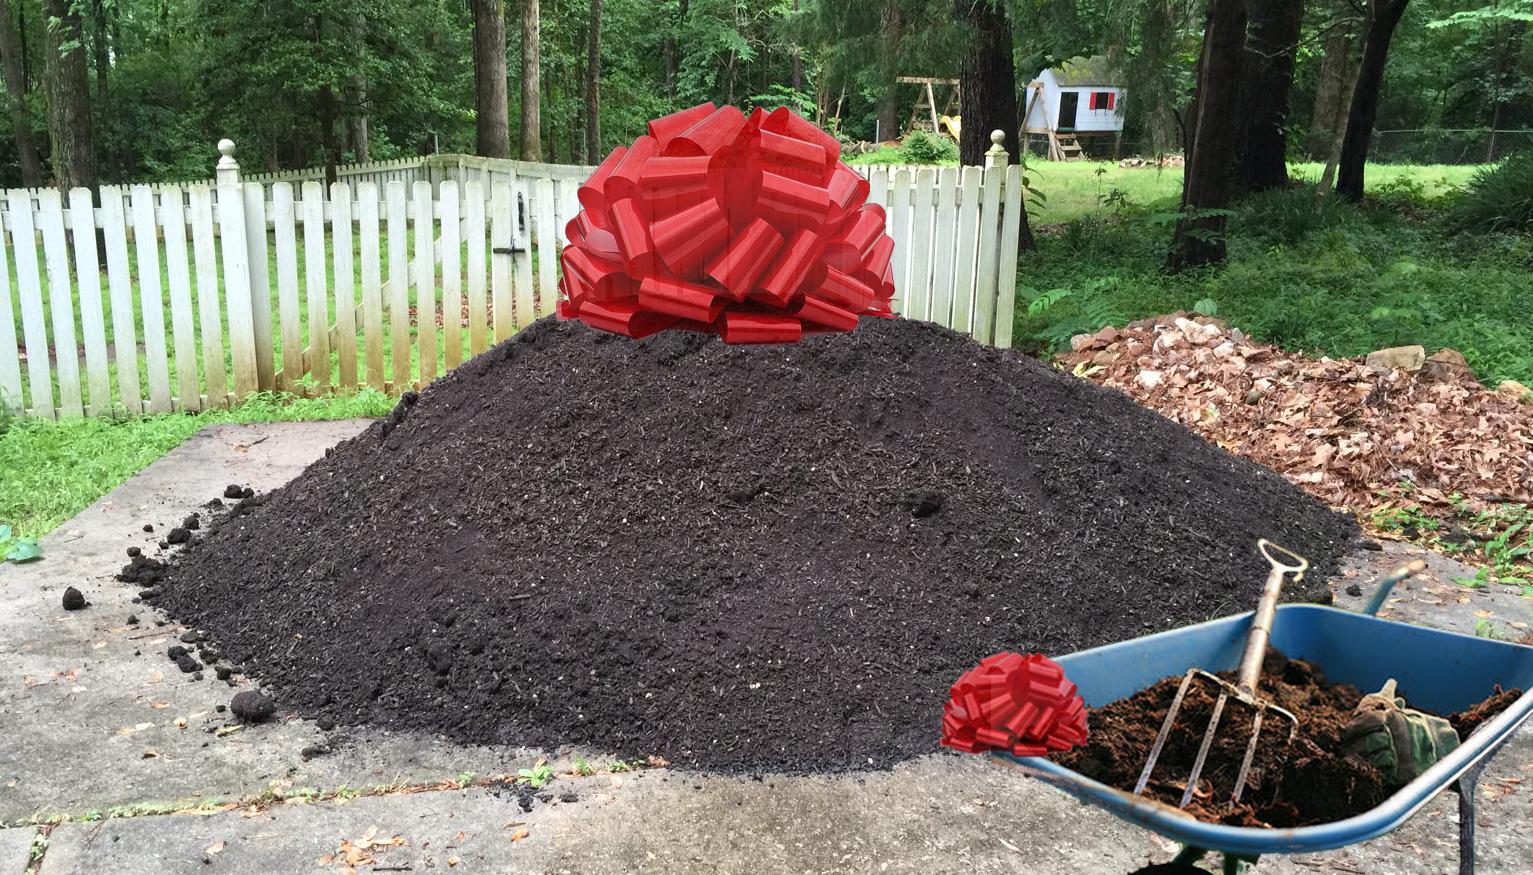 compost pile in driveway copy.jpg